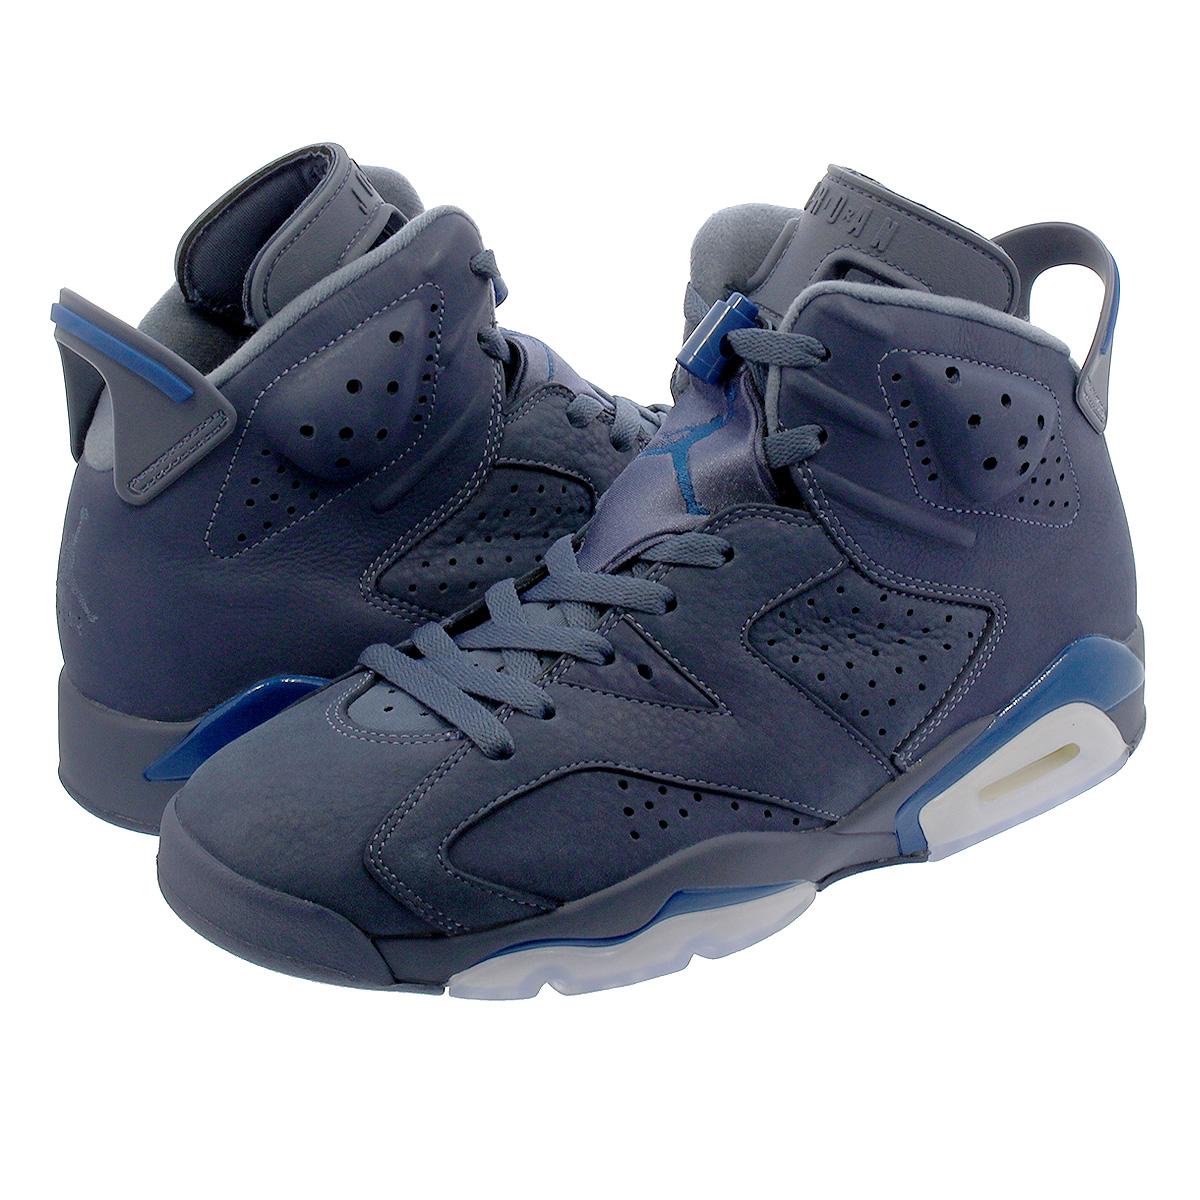 size 40 63742 31328 NIKE AIR JORDAN 6 RETRO Nike Air Jordan 6 nostalgic DIFFUSED BLUE/DIFFUSED  BLUE/COURT BLUE 384,664-400